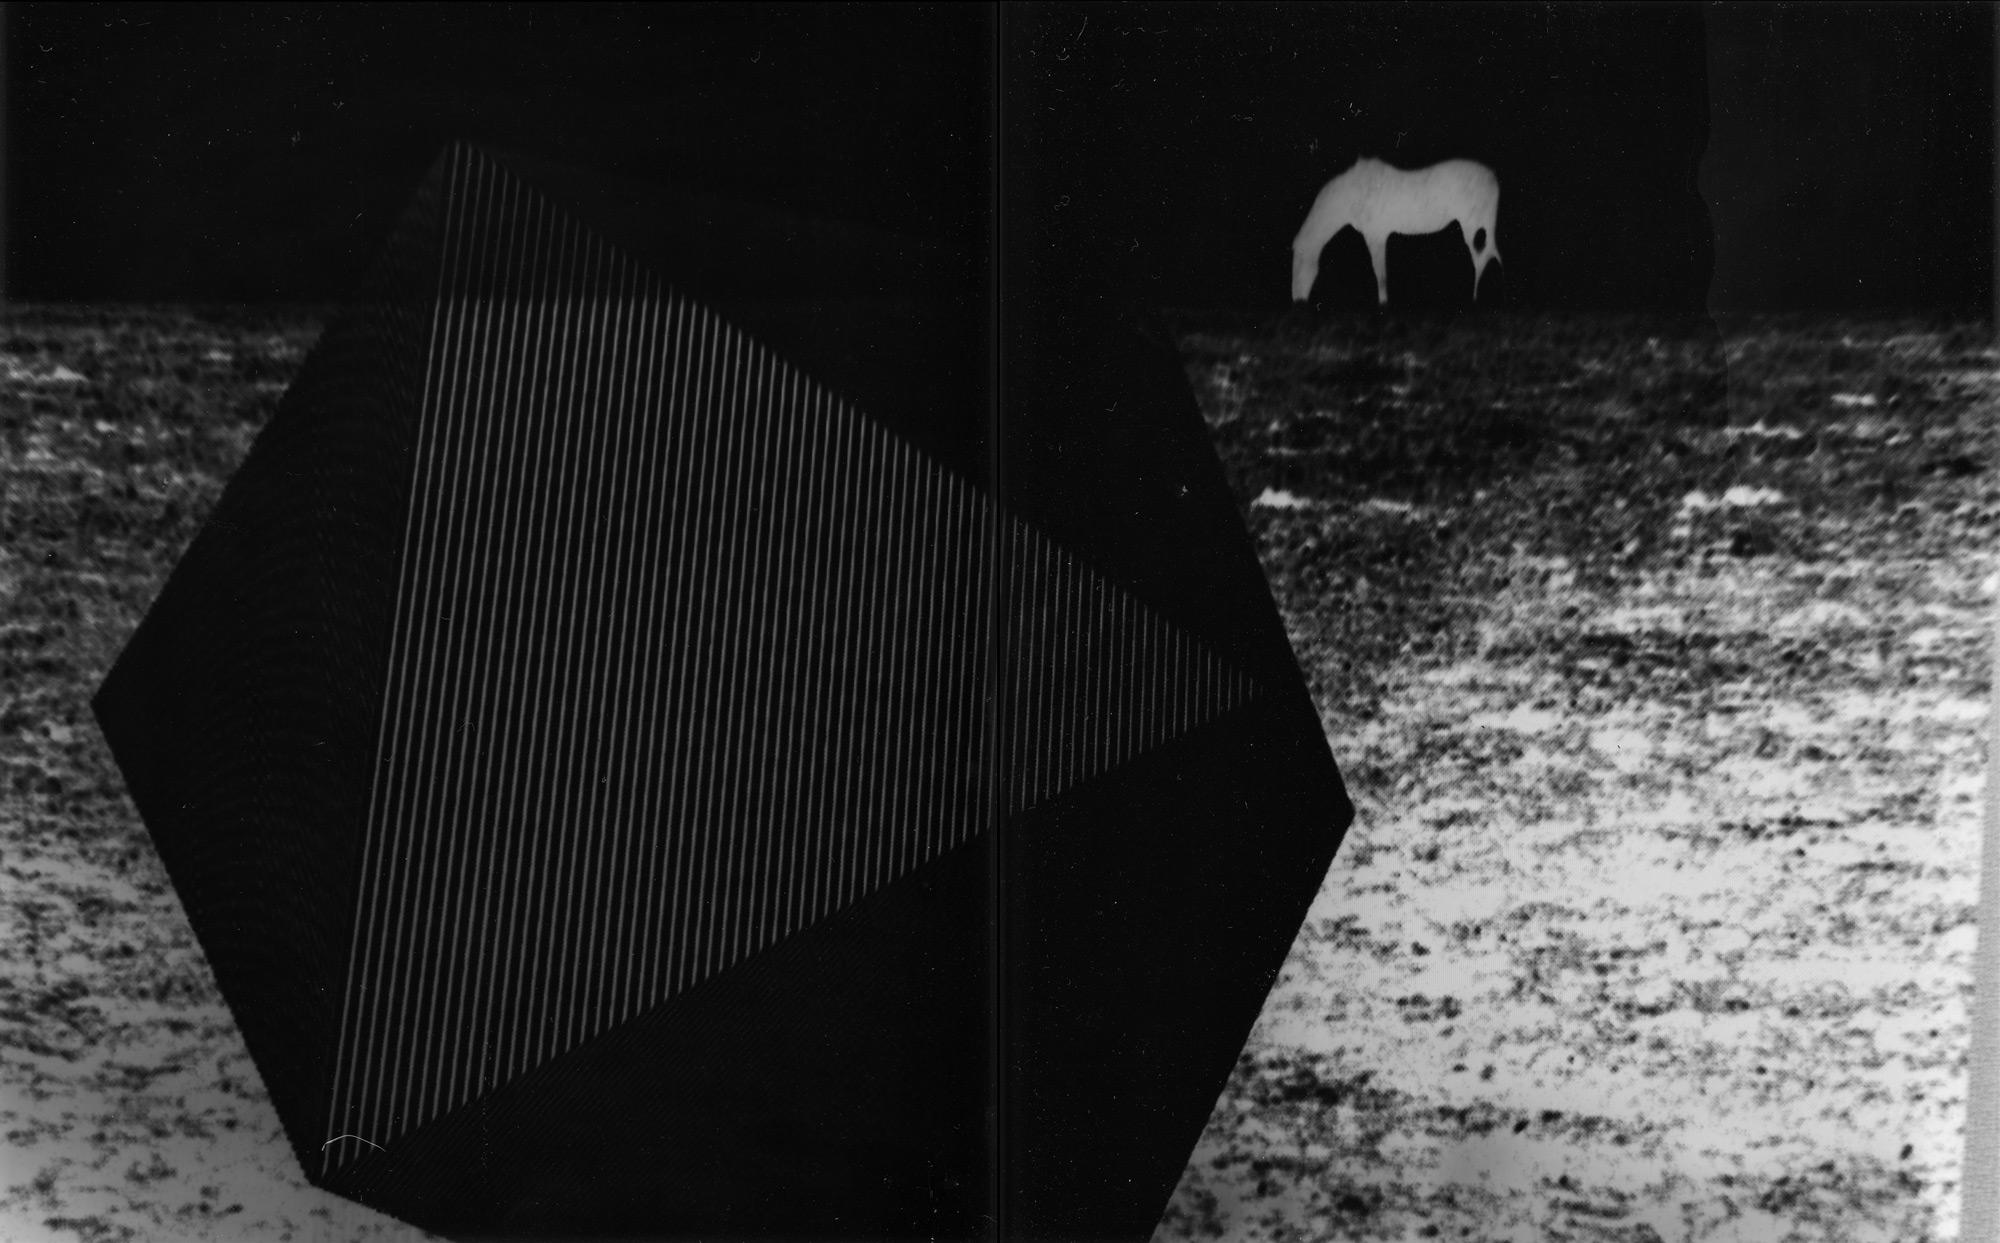 RRodner-Lumin-HorseAndIcosahedron.jpg